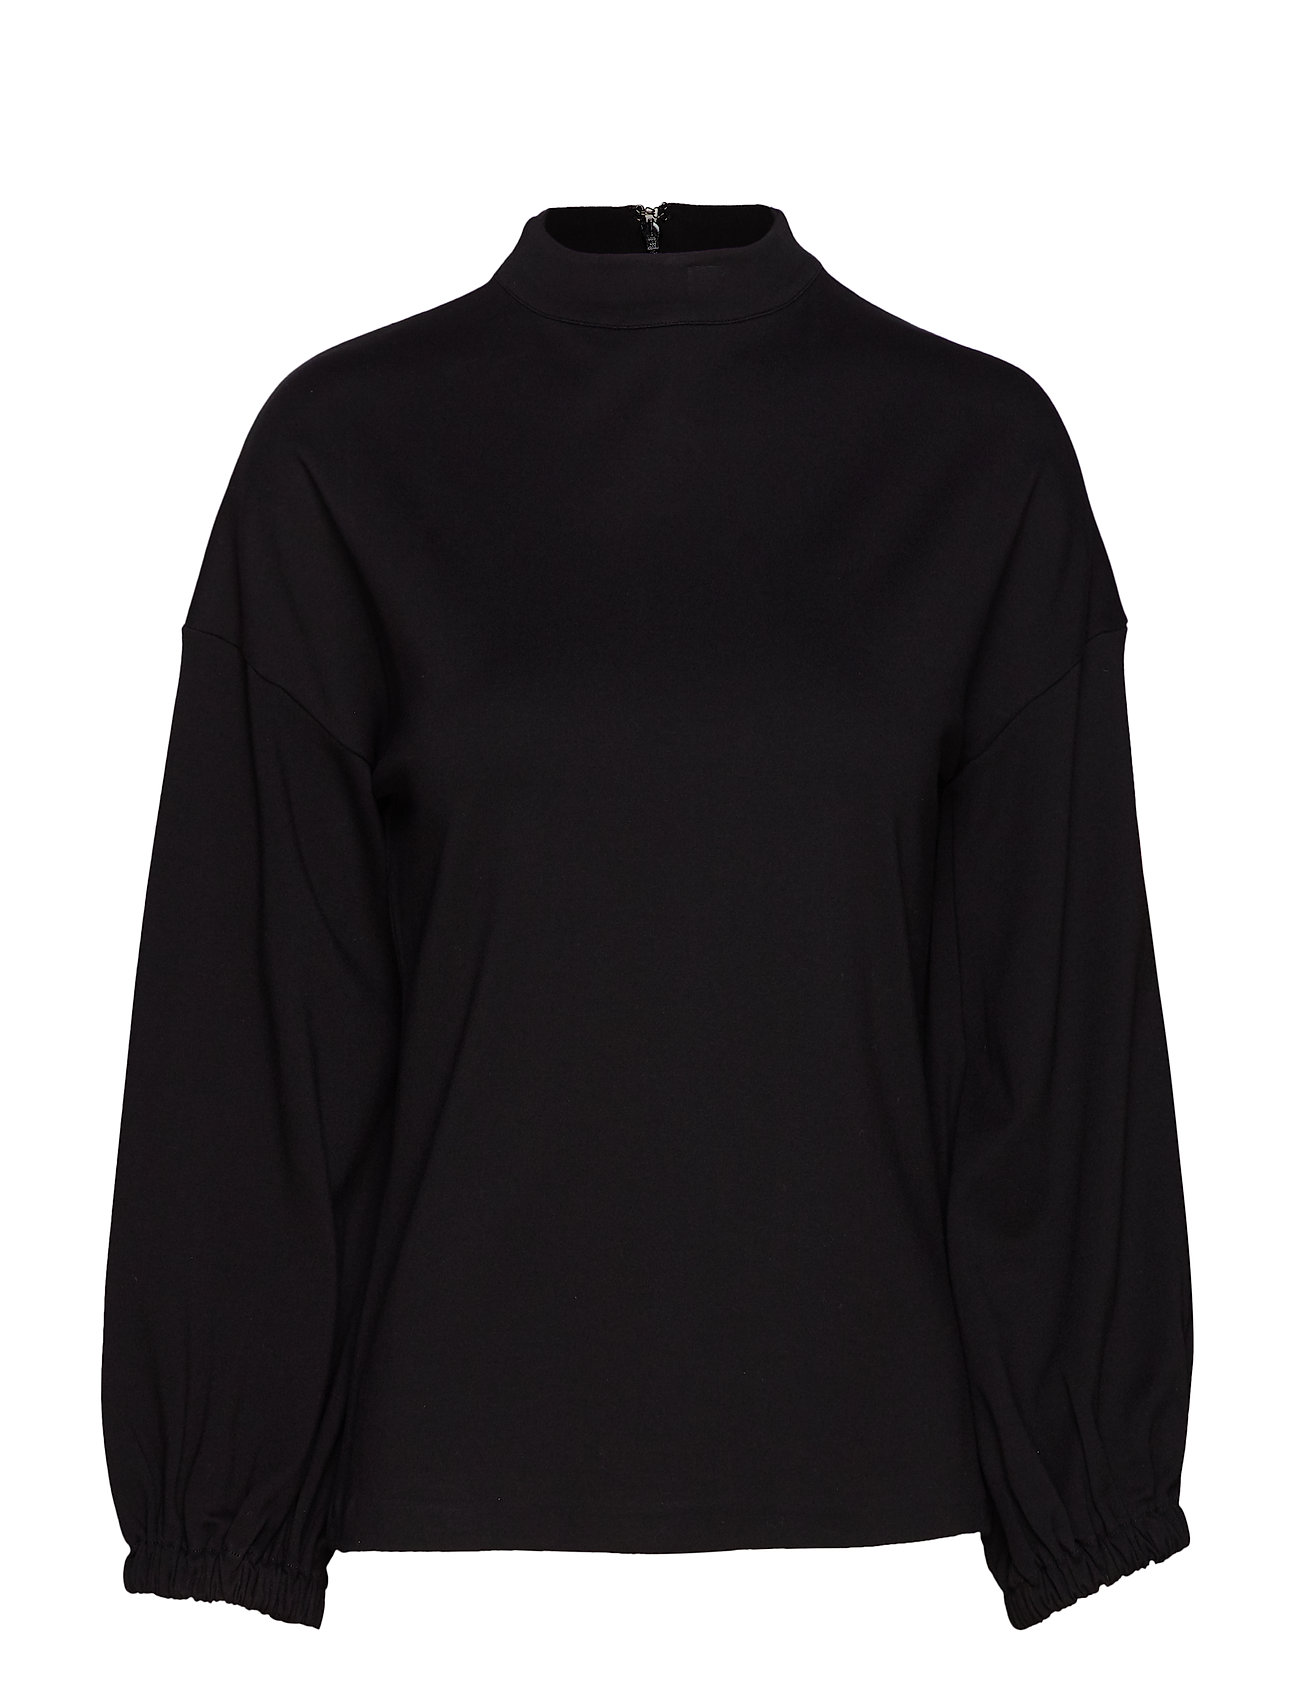 Residus Soraya Top - BLACK